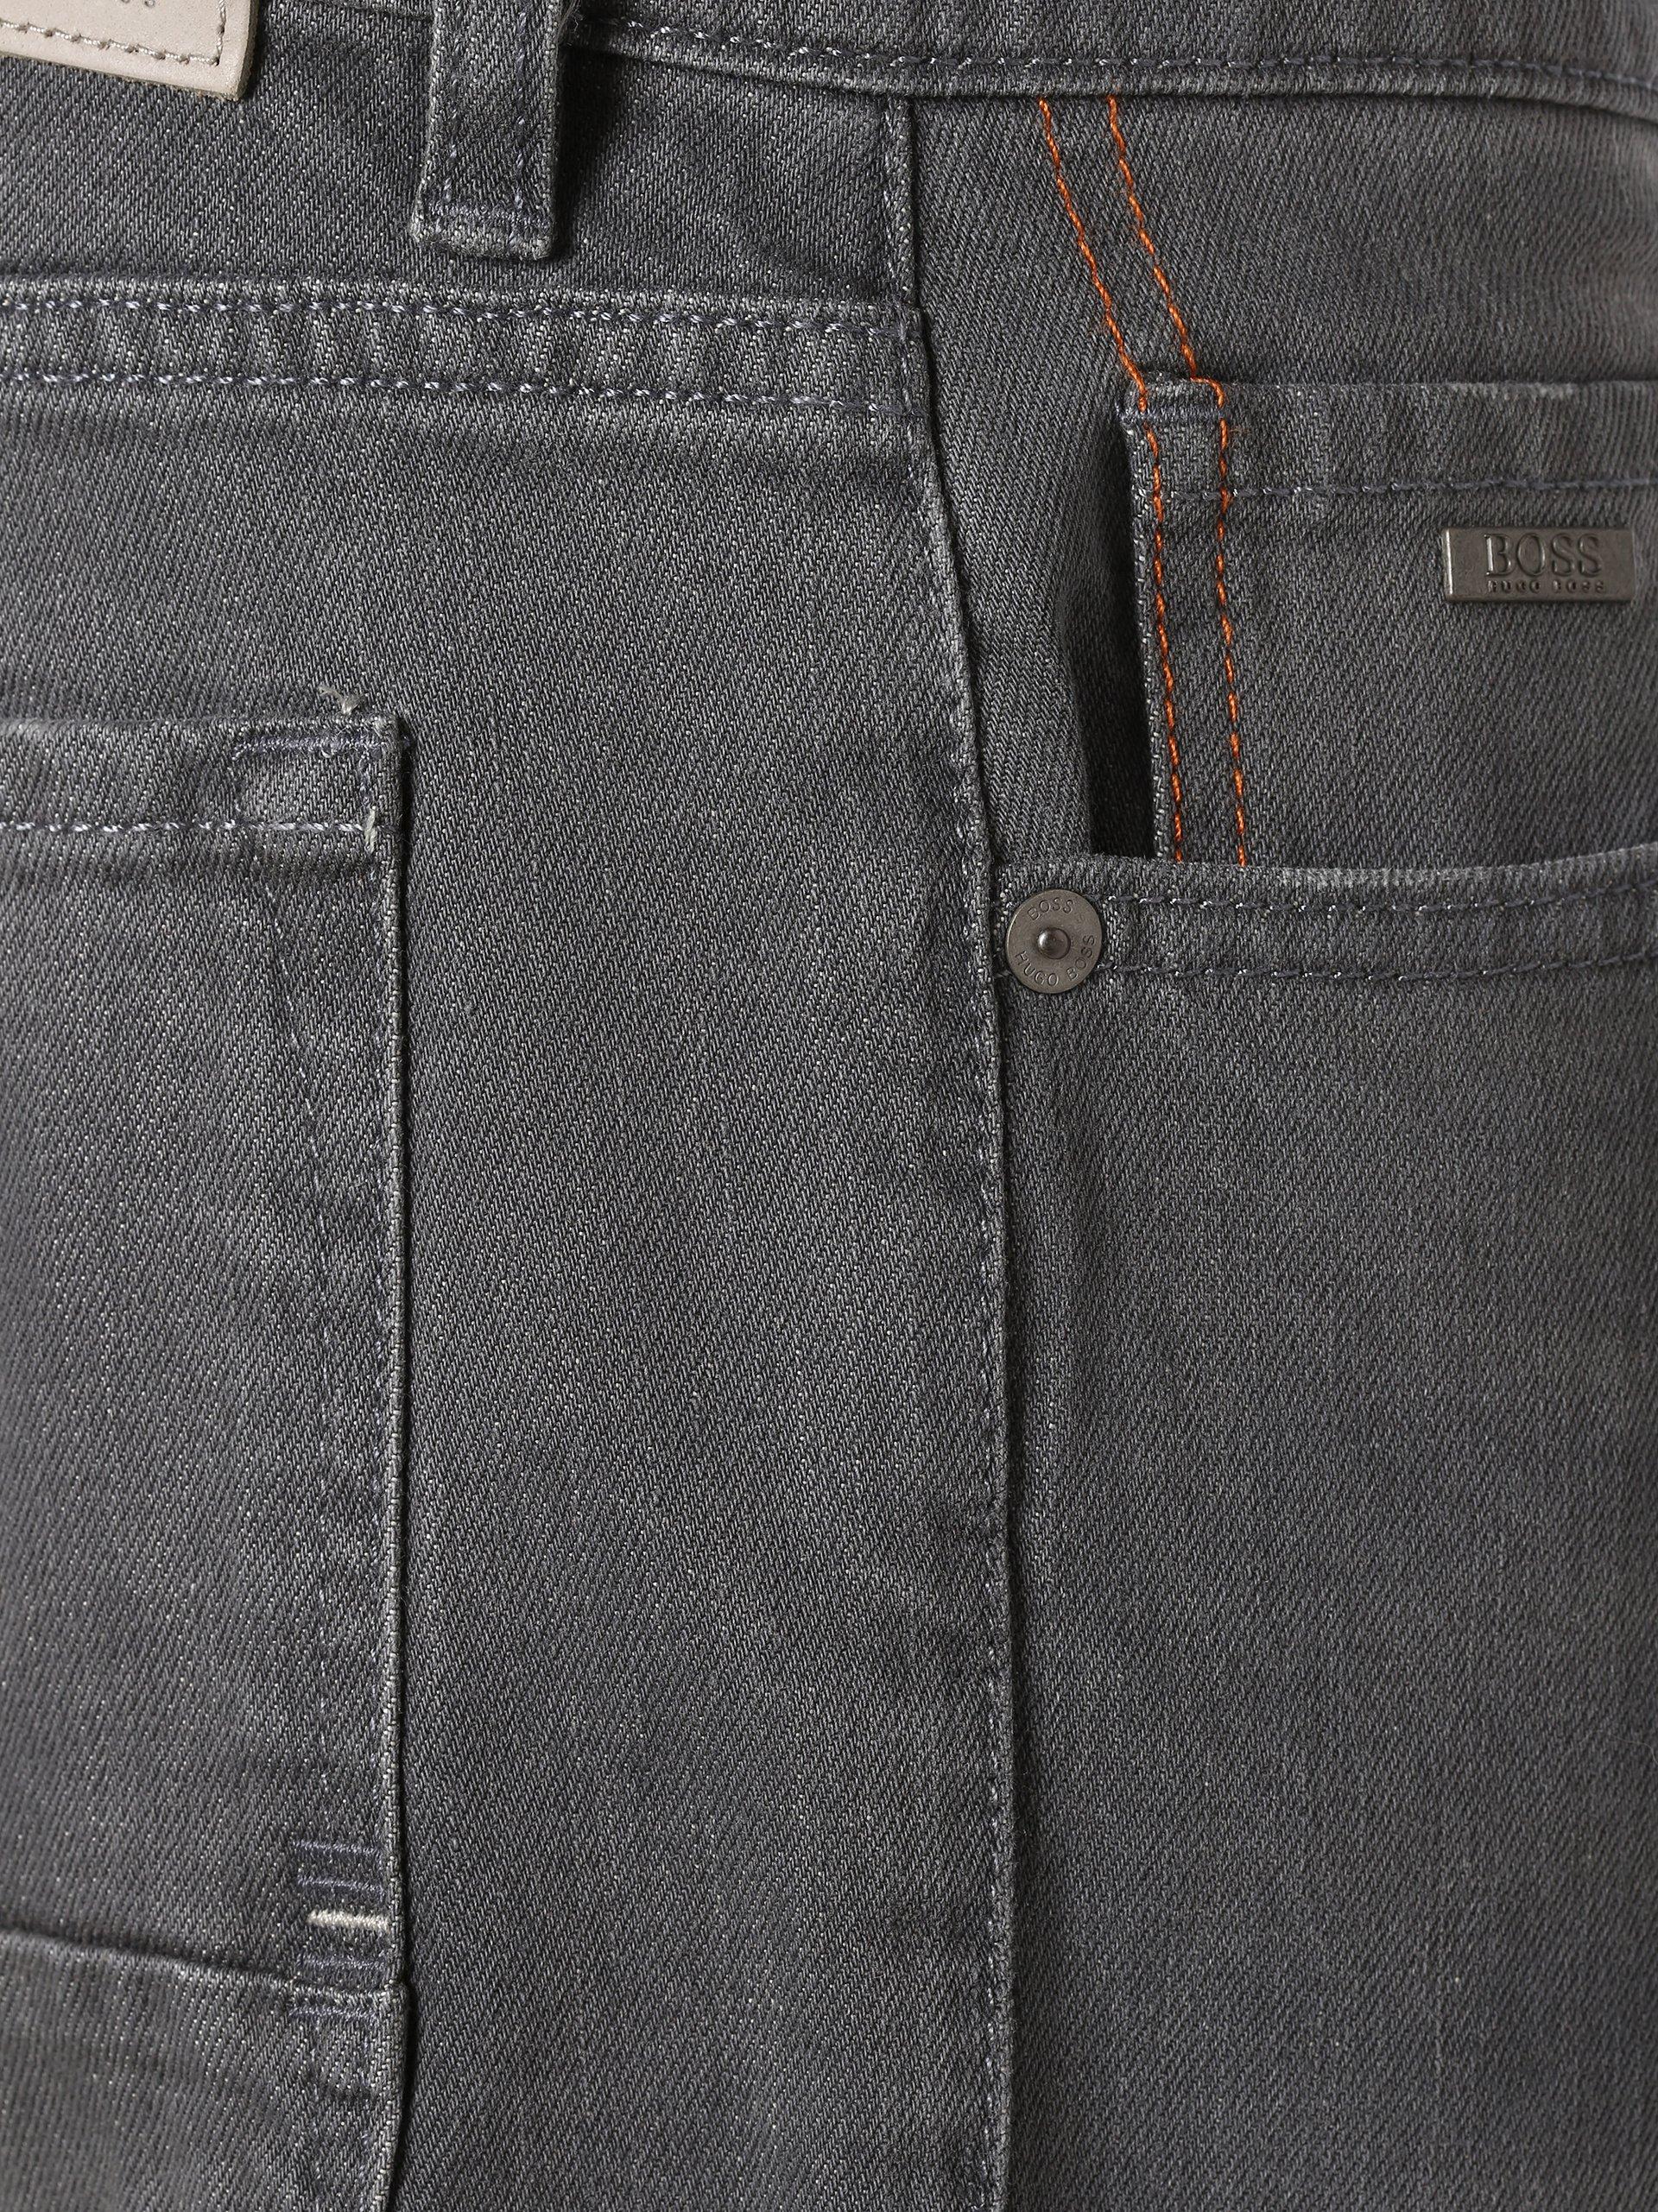 BOSS Casual Herren Jeans - 030 Maine